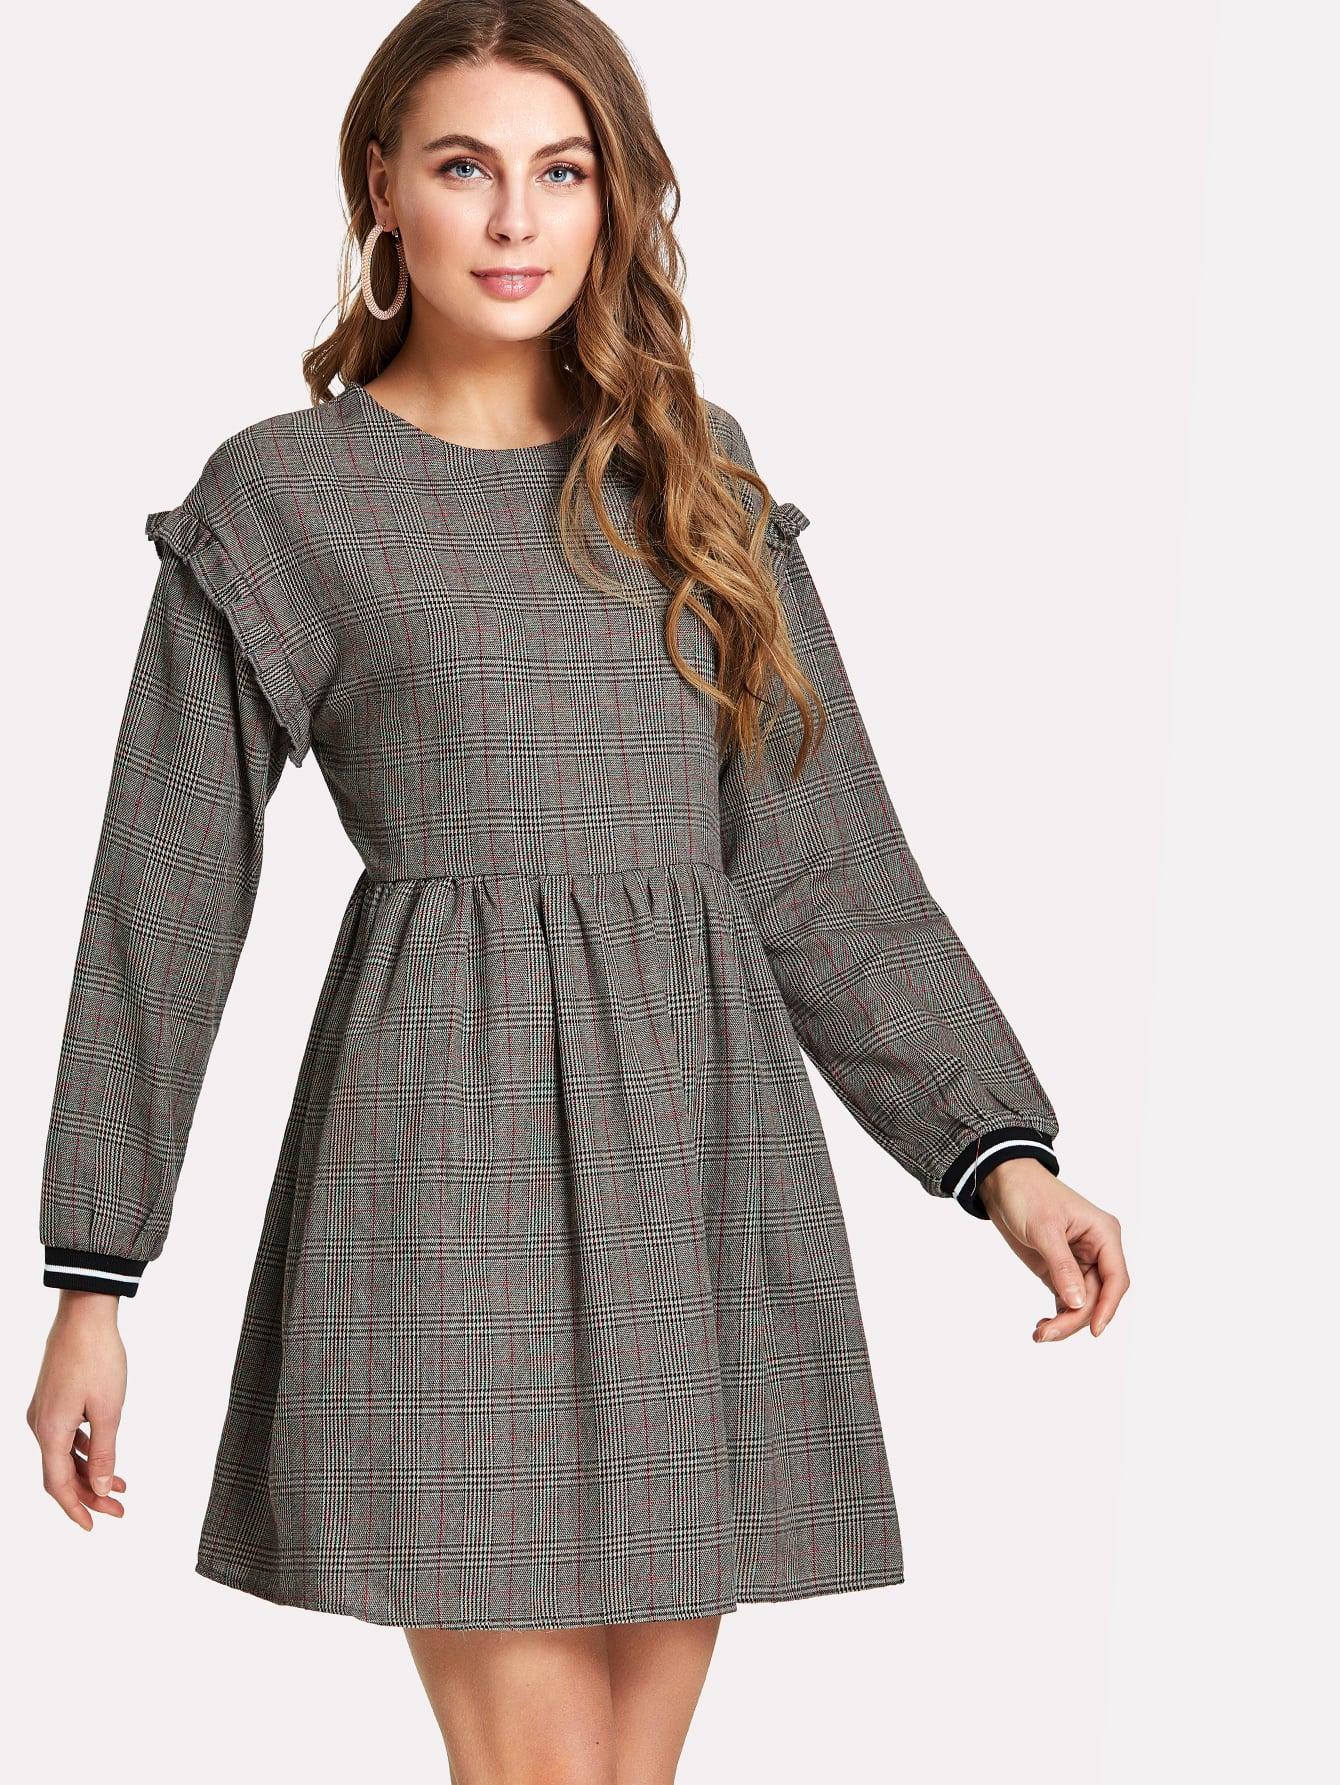 Frill Trim Striped Cuff Plaid Smock Dress open shoulder frill trim plaid dress